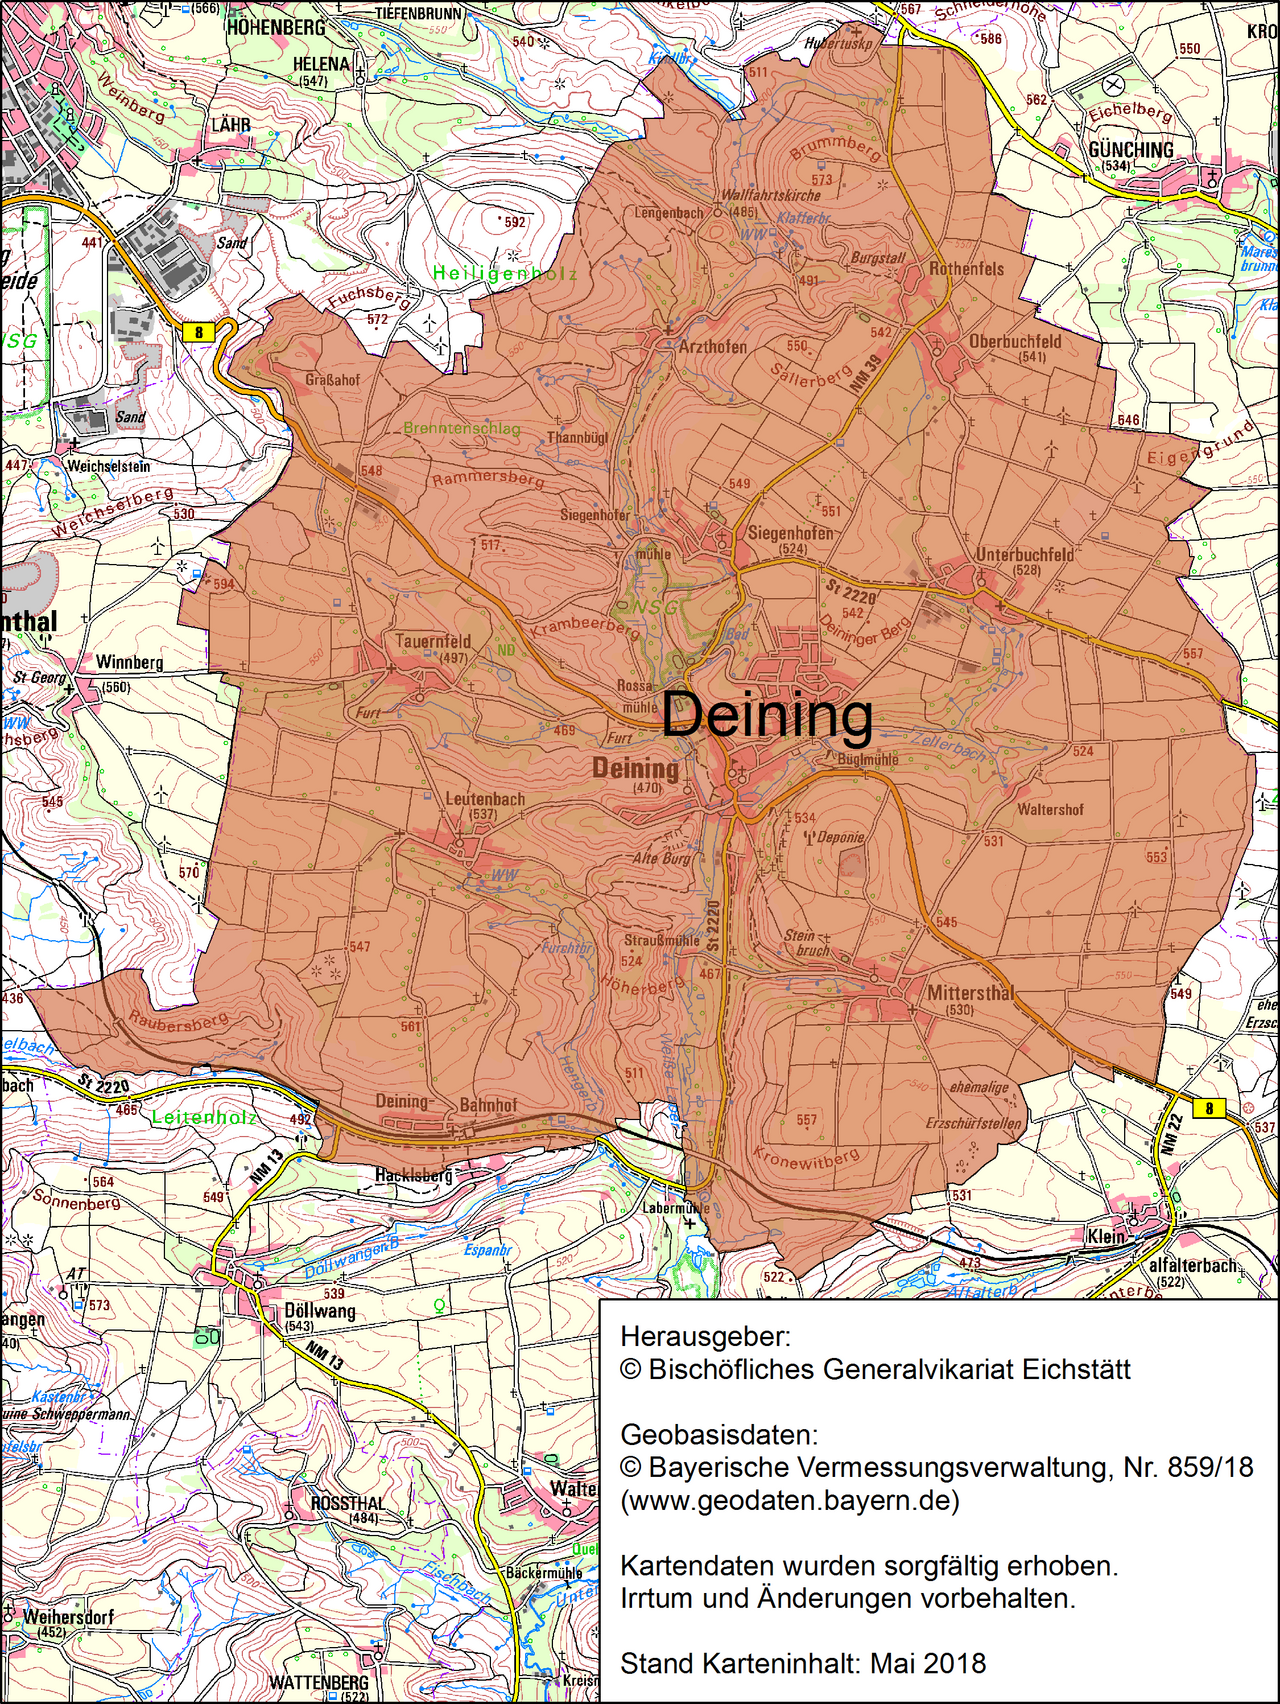 Pfarrei Deining